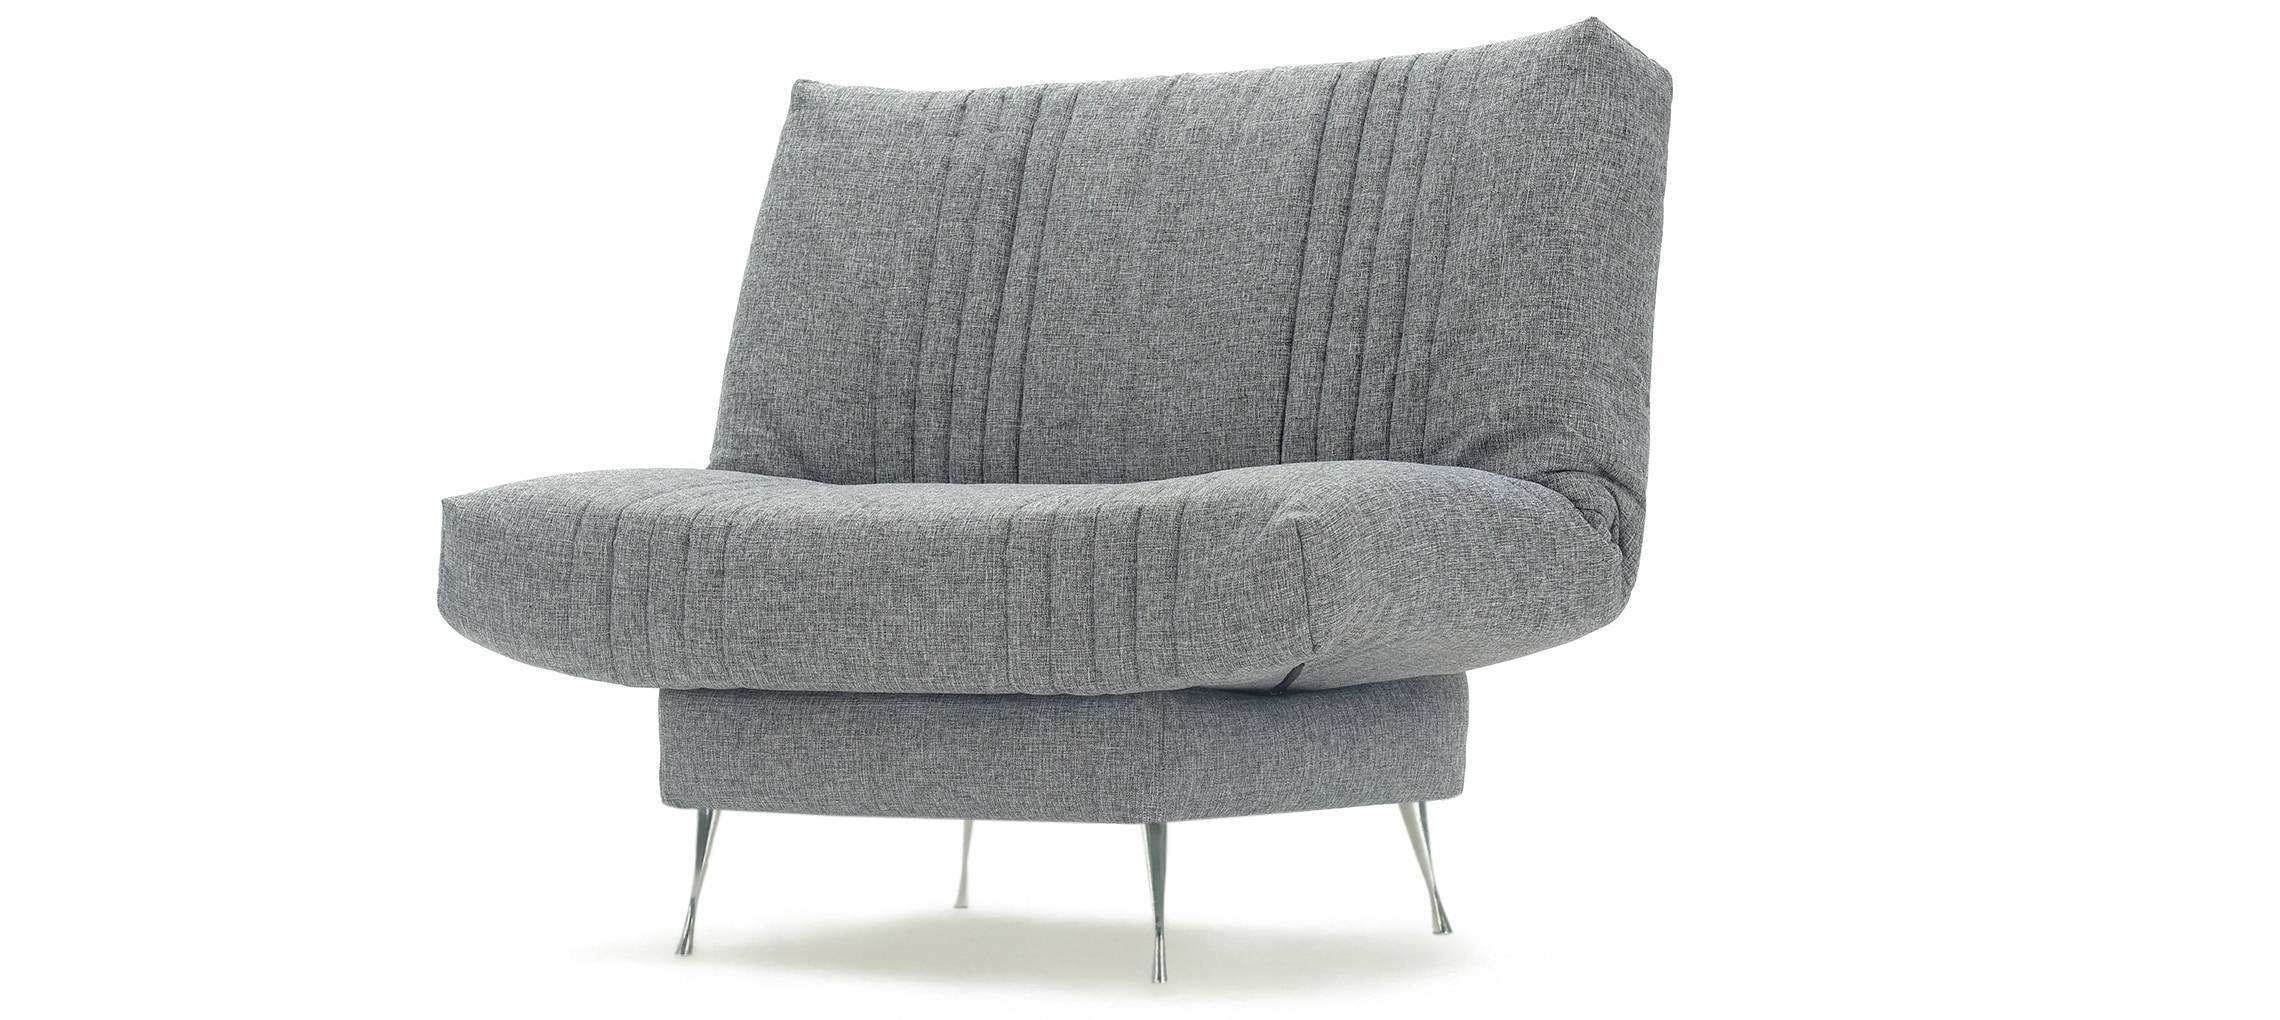 СИТИ Кресло Рогожка Натура серый